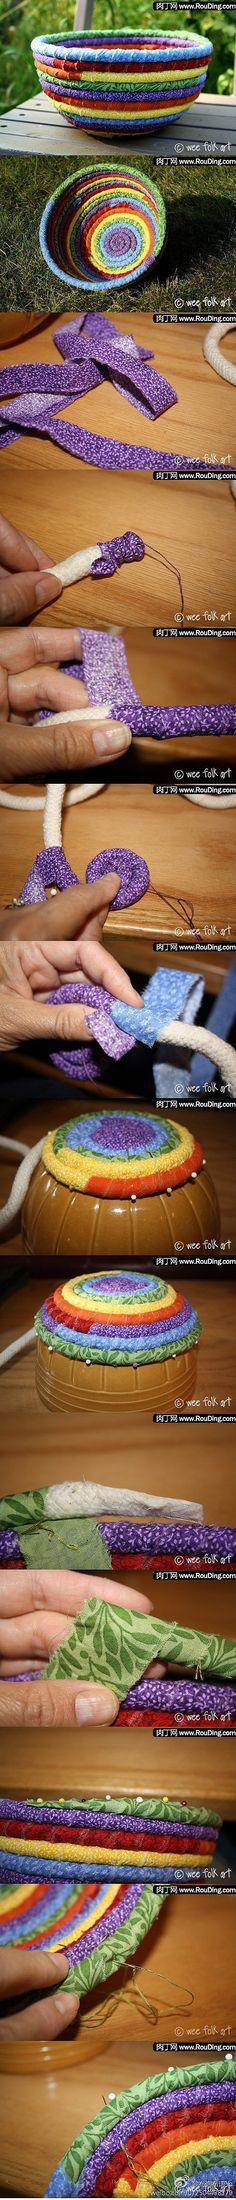 Fabric Basket tutorial no sewing machine!